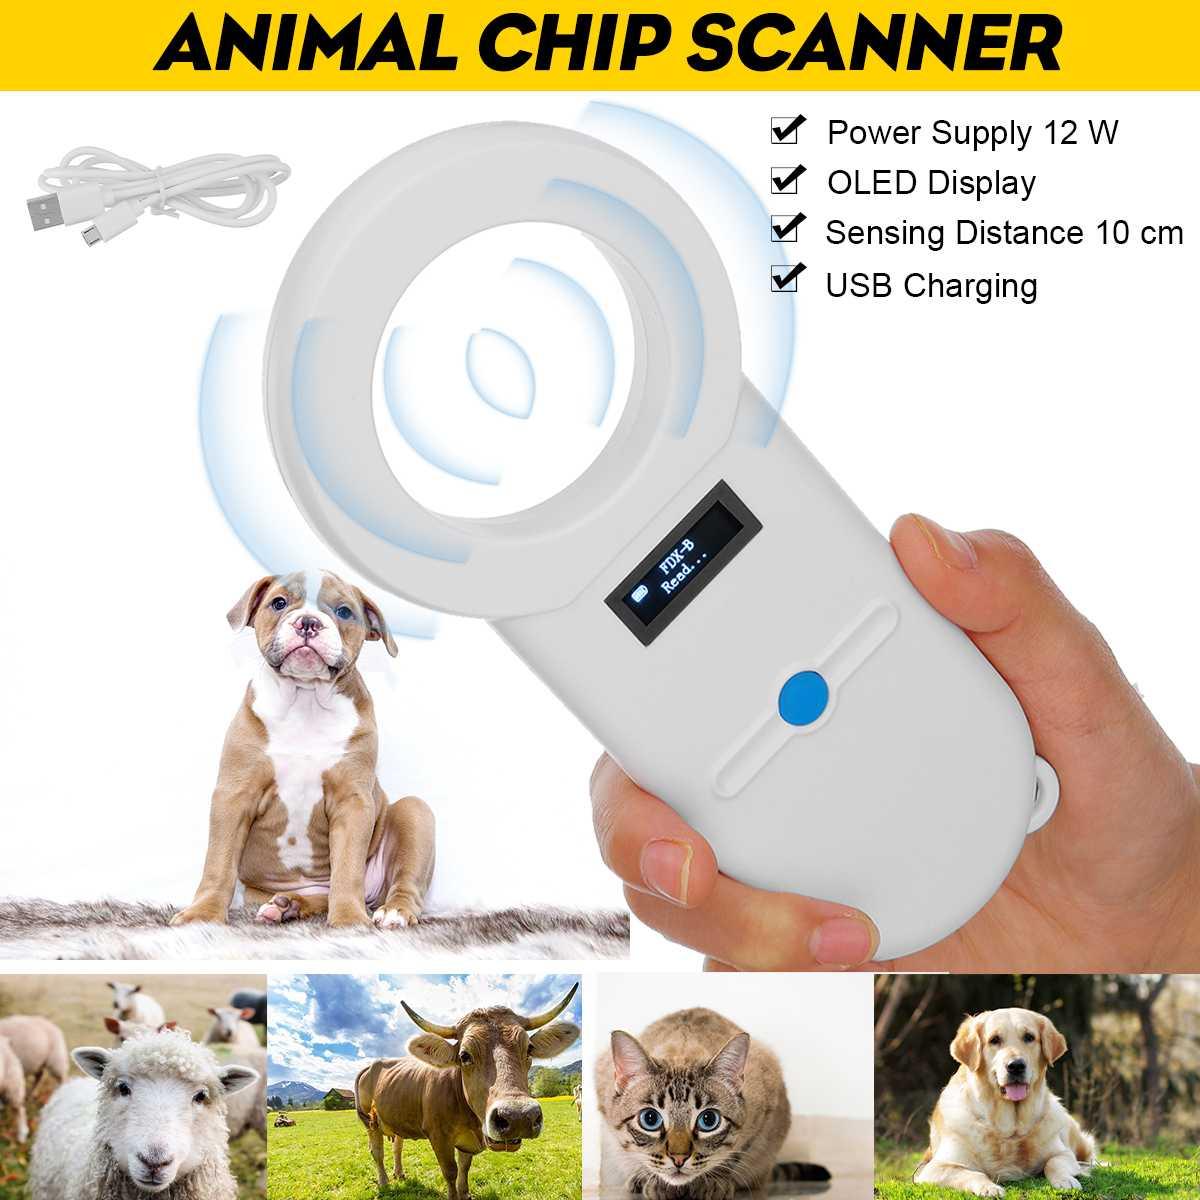 Pet ID Reader Animal Chip Digital Scanner USB Rechargeable Handheld Microchip Scanner General For Cat Dog Horse